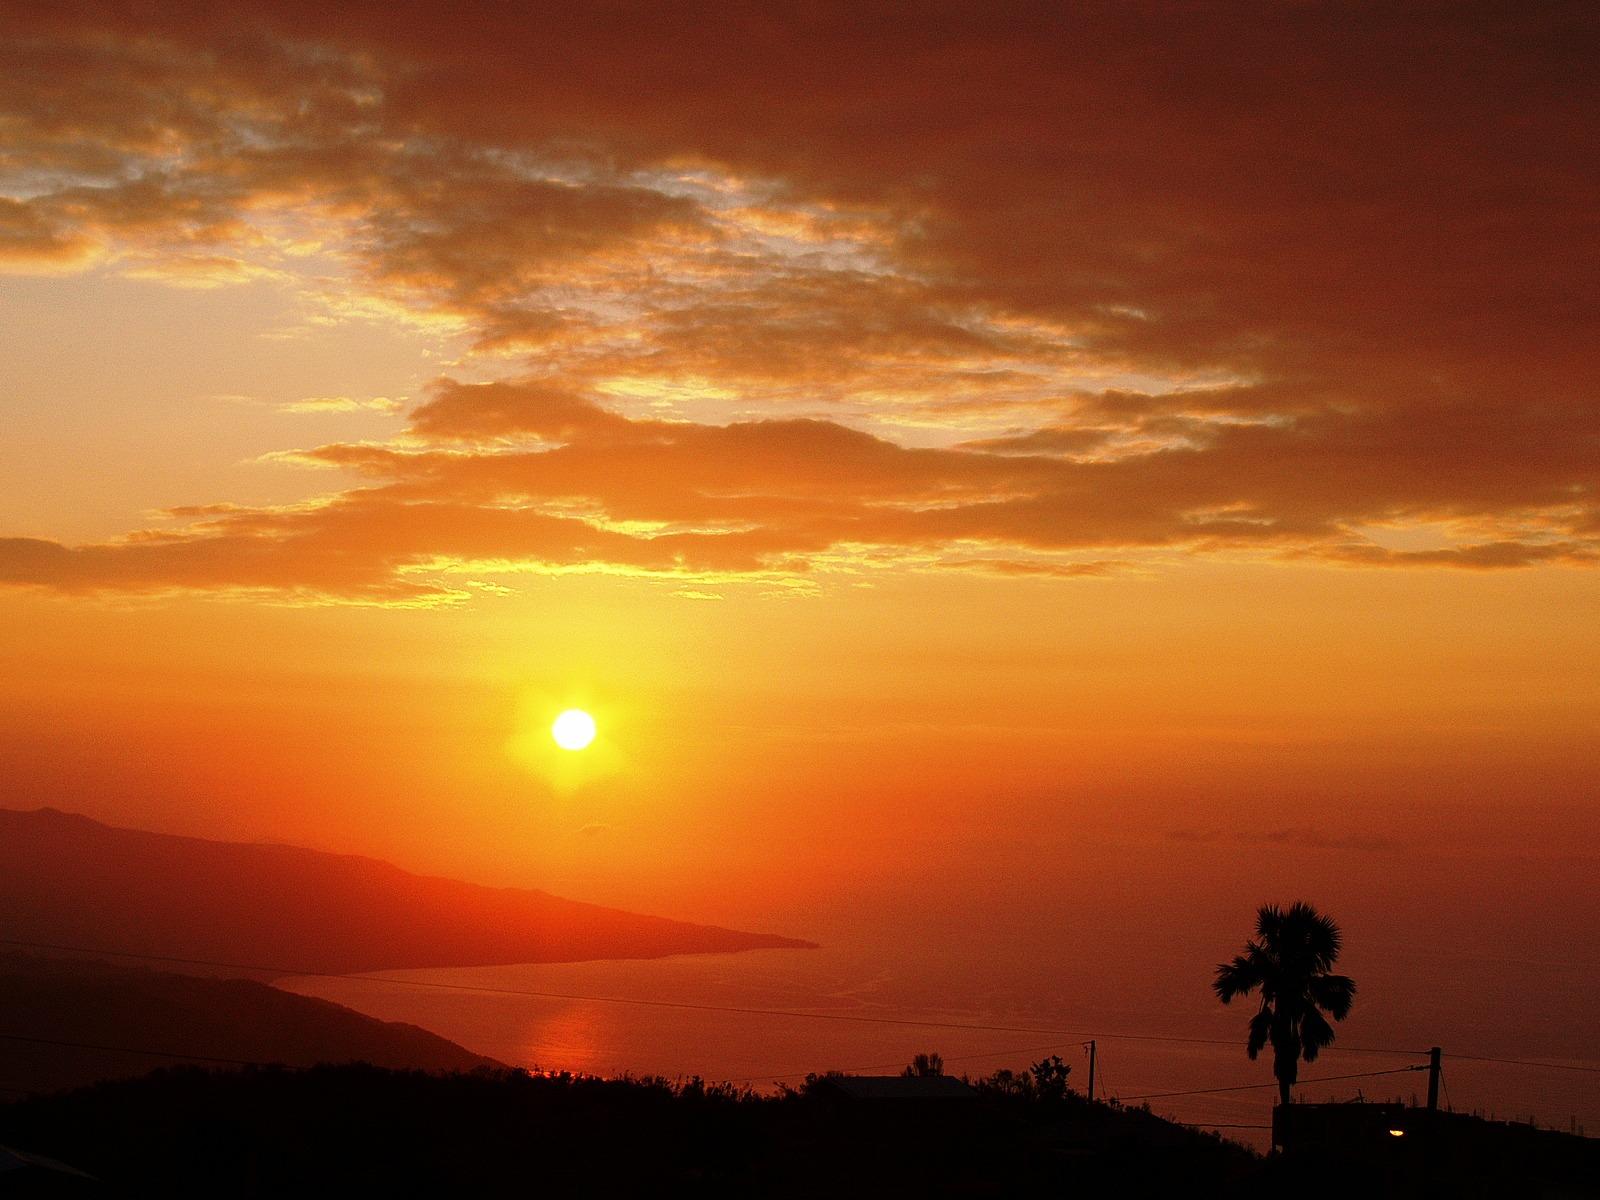 File:Jamaica sunrise.JPG - Wikipedia